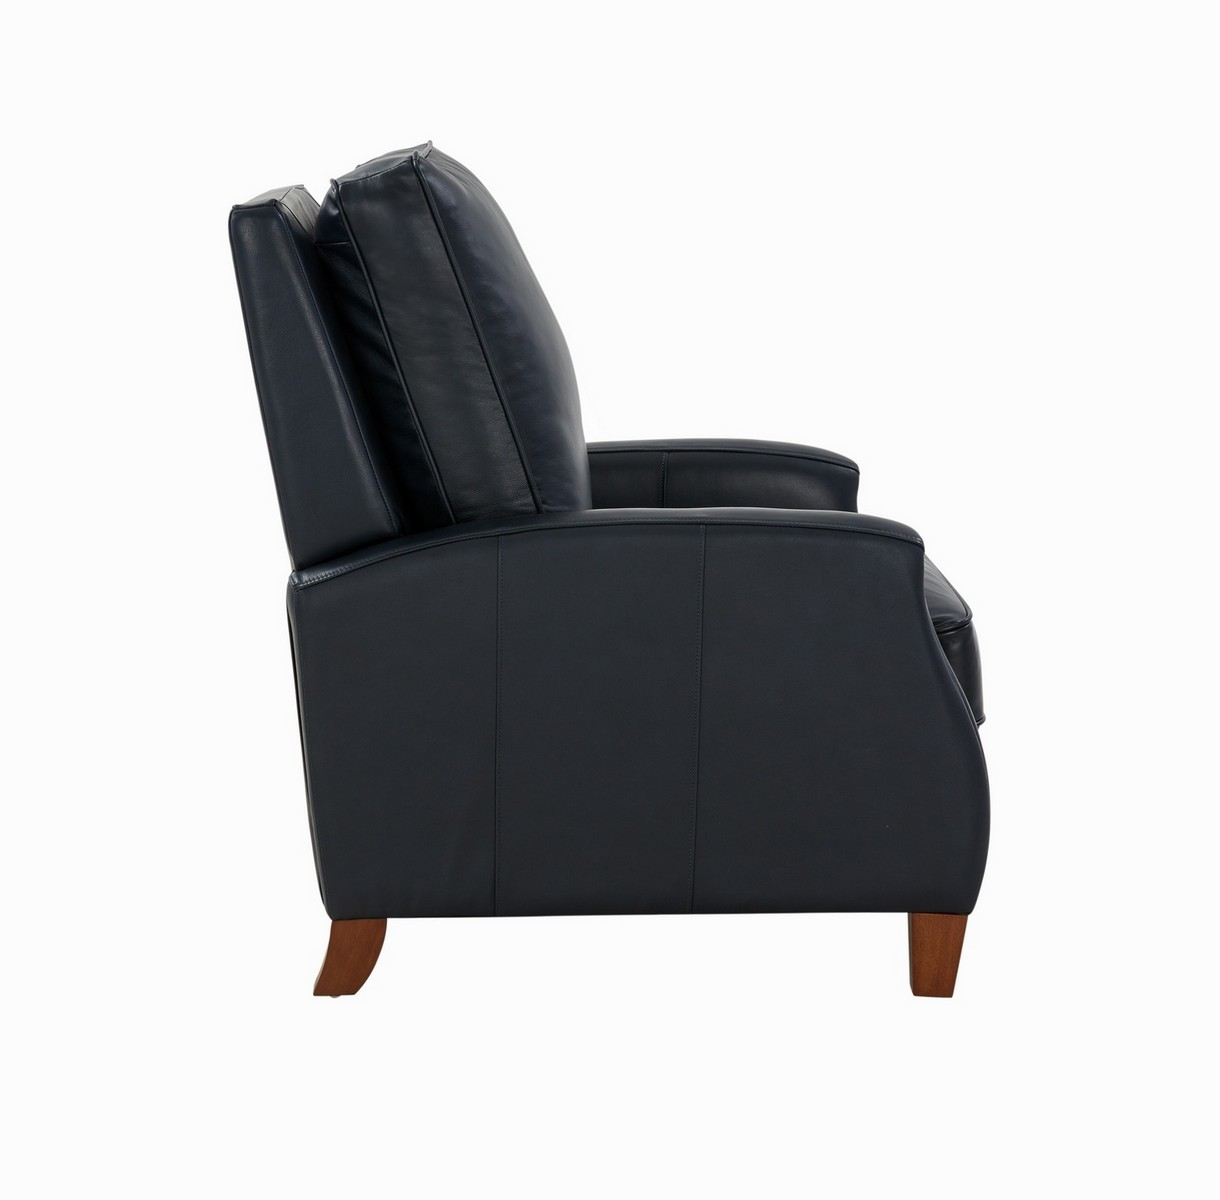 Barcalounger Penrose Recliner Chair - Shoreham Blue/All Leather